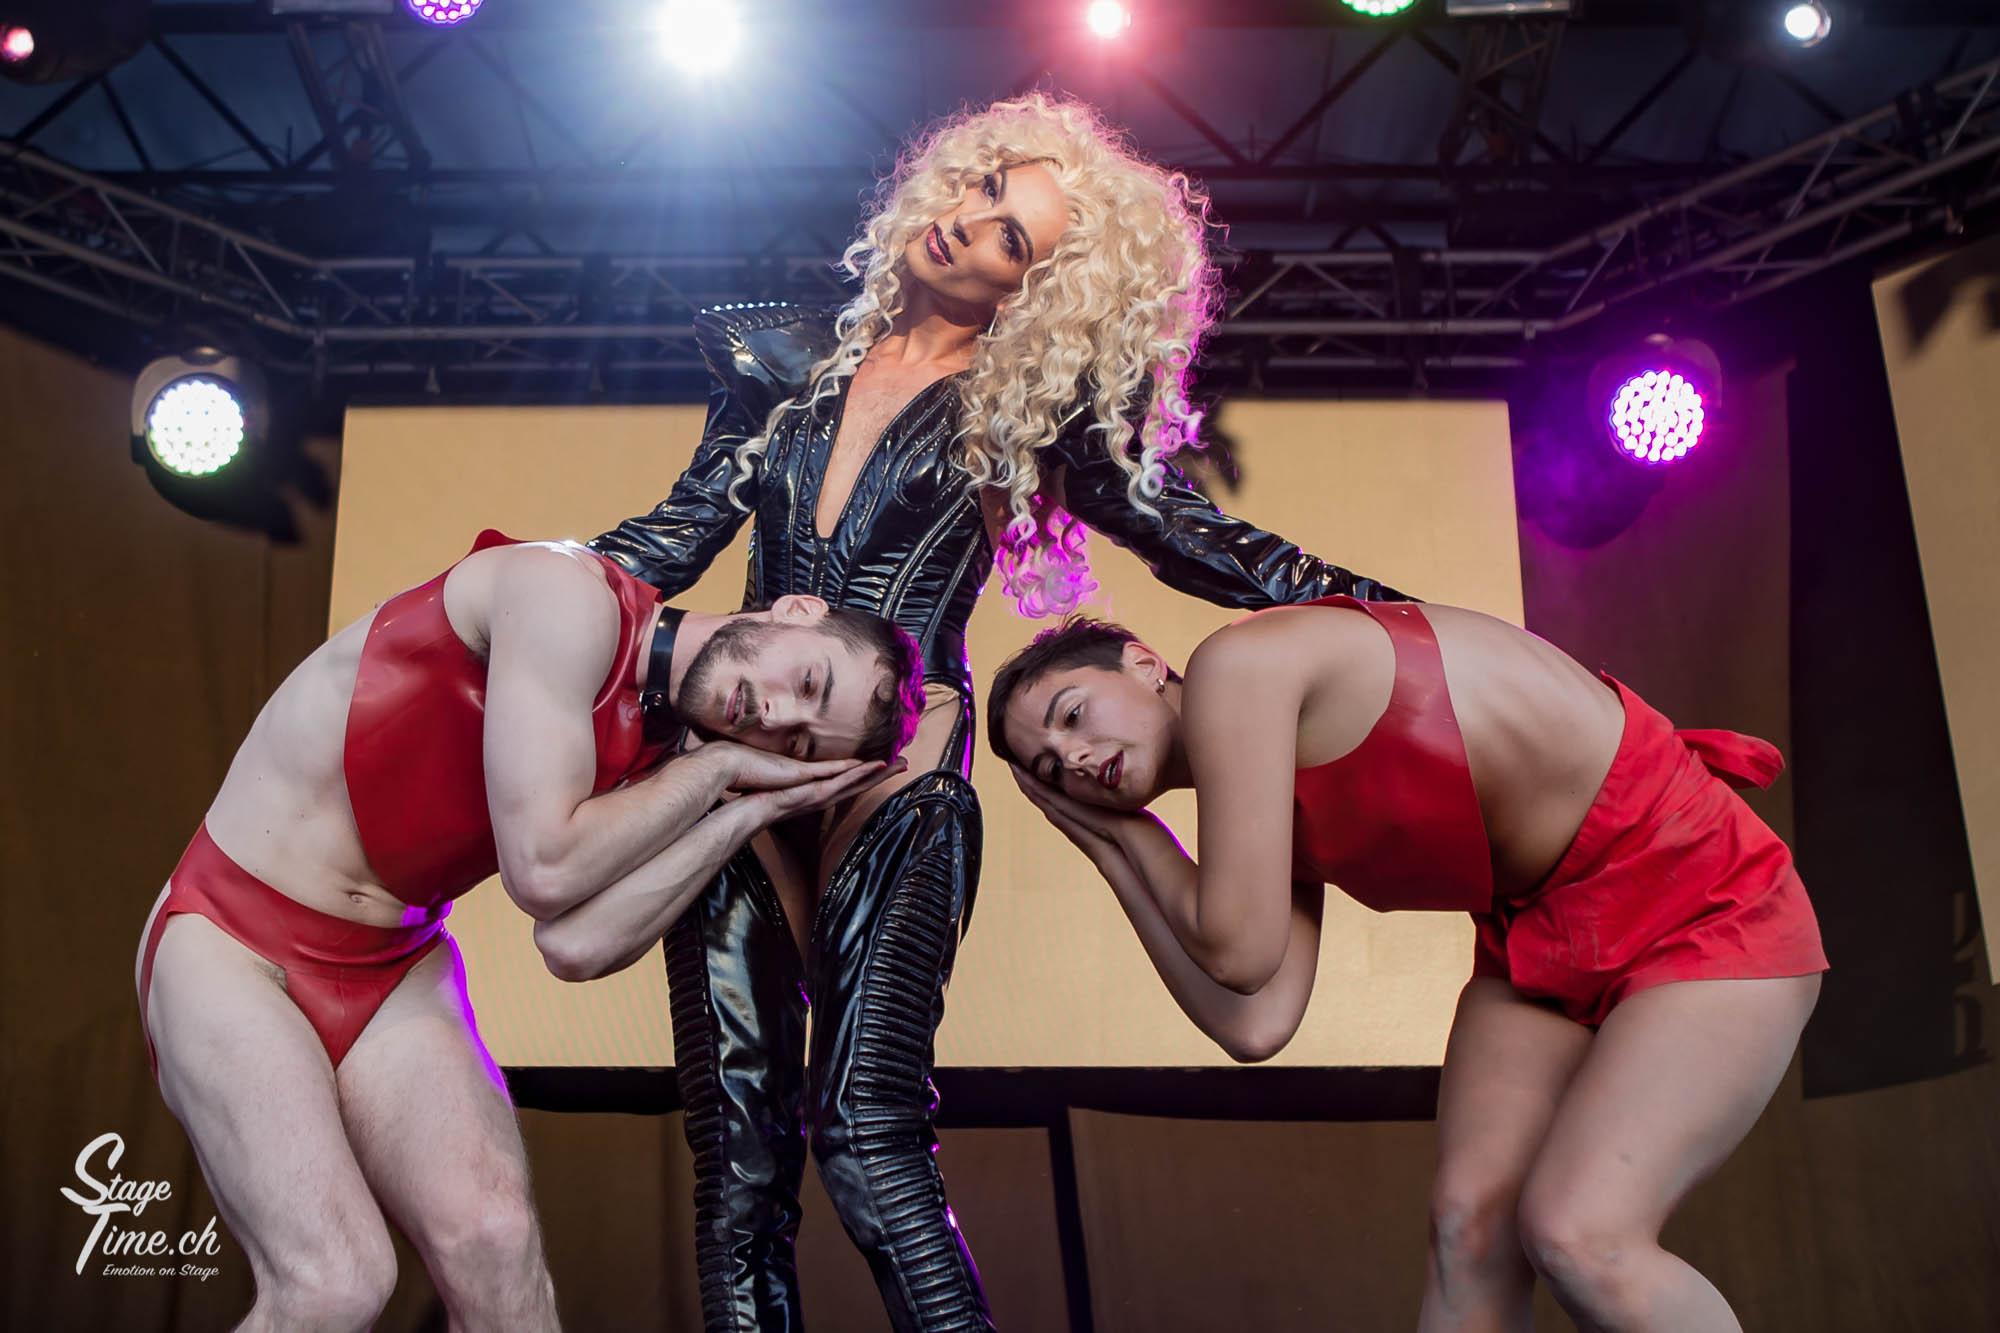 Zurich_Pride_Festival_2018___📷_Christoph_Gurtner___stagetime.ch-22